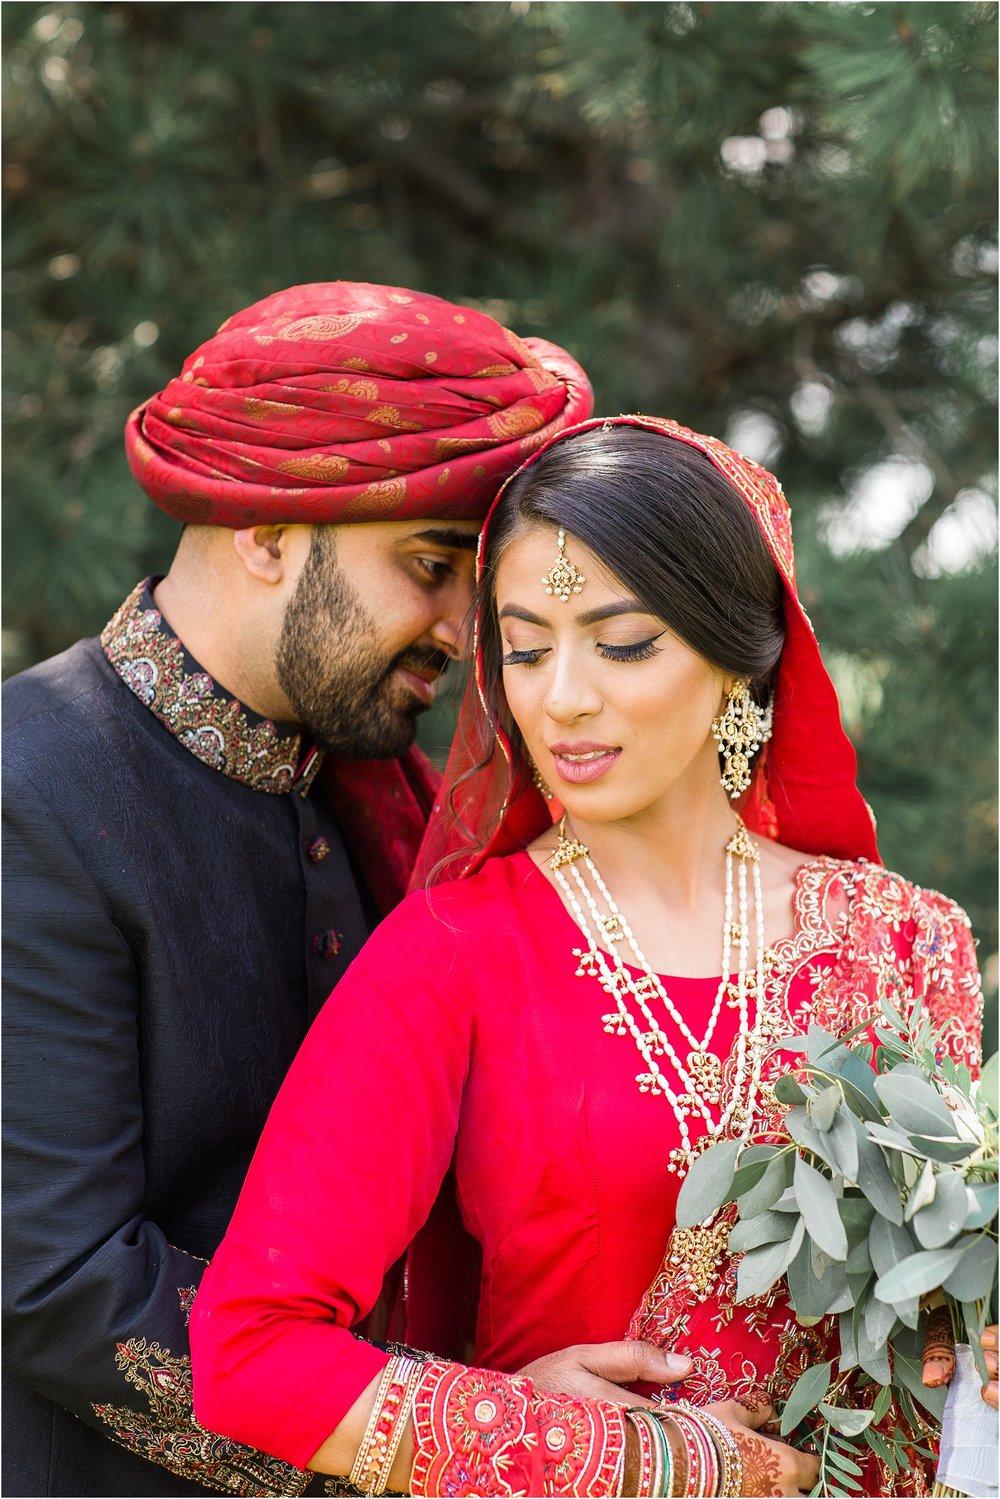 Jame-Masjid-Coopers-Mosque-Kariya-Park-Cherry-Blossoms-Wedding-Toronto-Mississauga-Brampton-Scarborough-GTA-Pakistani-Indian-Wedding-Engagement-Photographer-Photography_0021.jpg